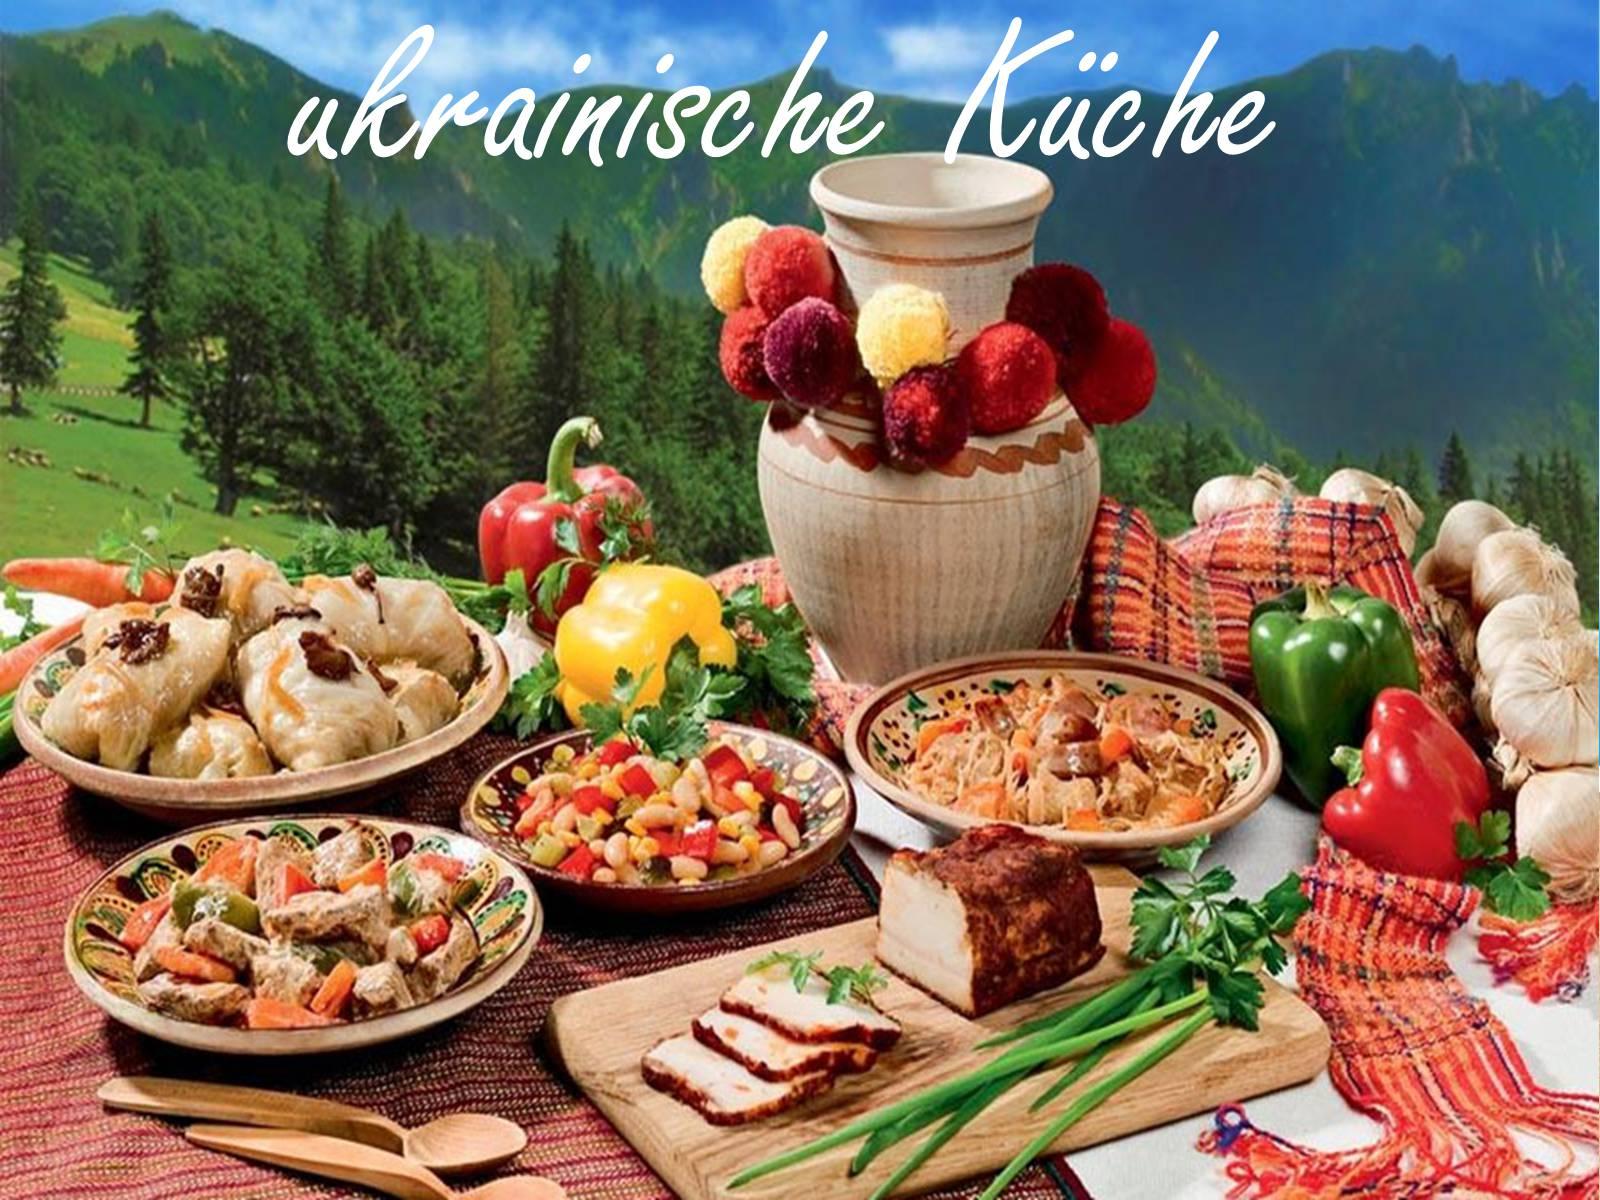 Ukrainische Kuche Berlin